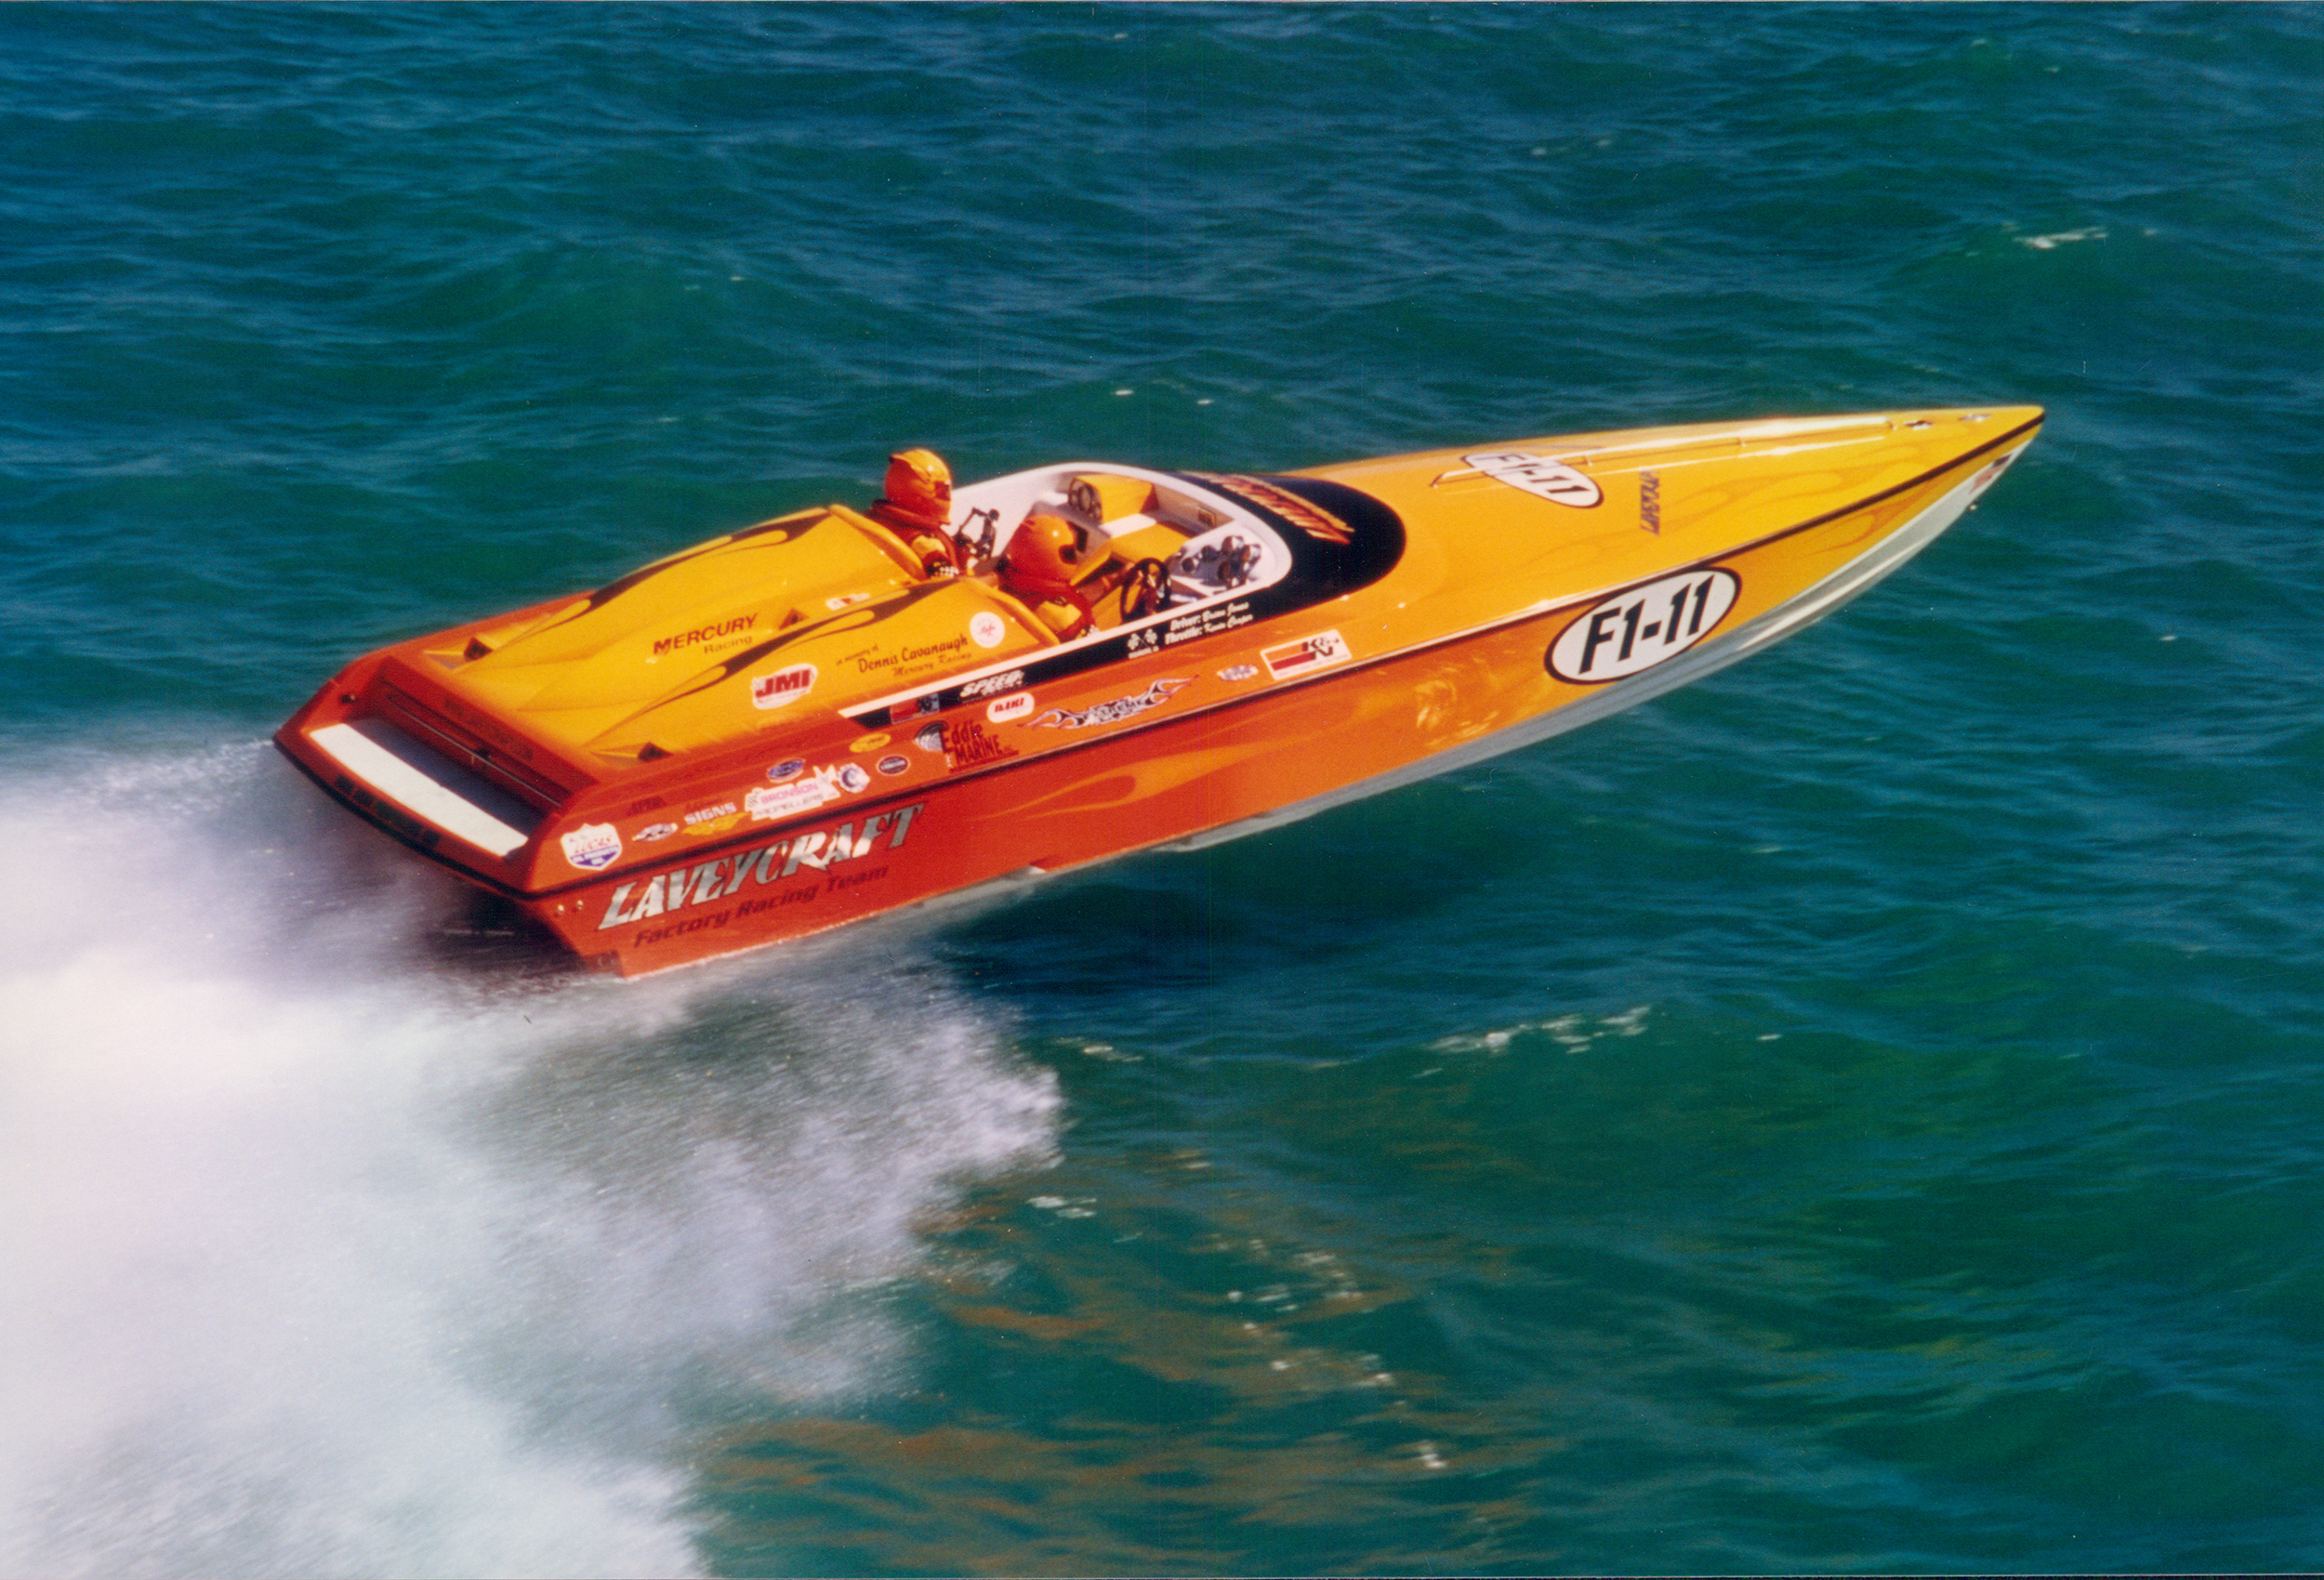 2750 NuEra Lavey Craft - racing 3.jpg